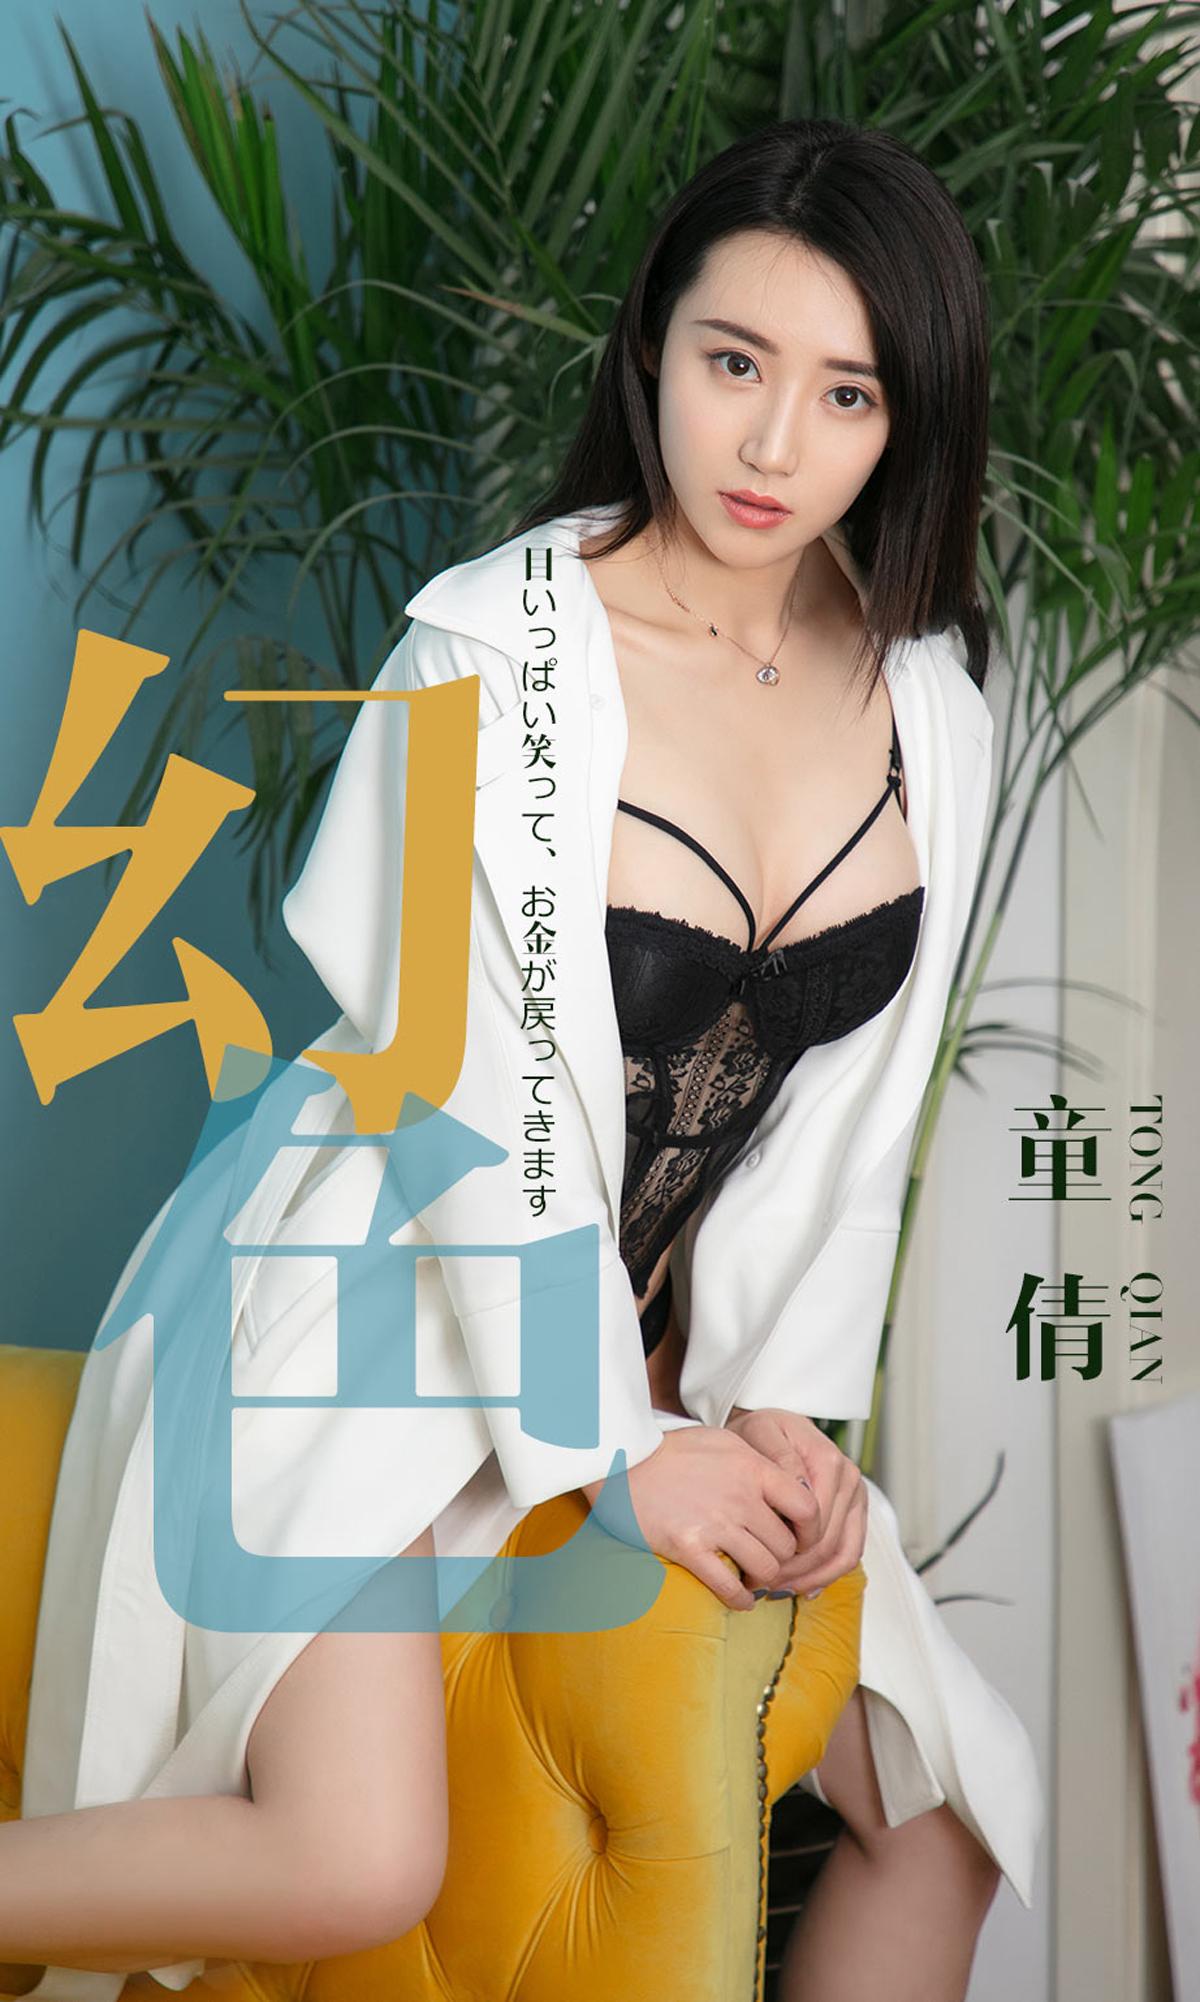 [Ugirls]爱尤物 No.1441 幻色 童倩 [31P